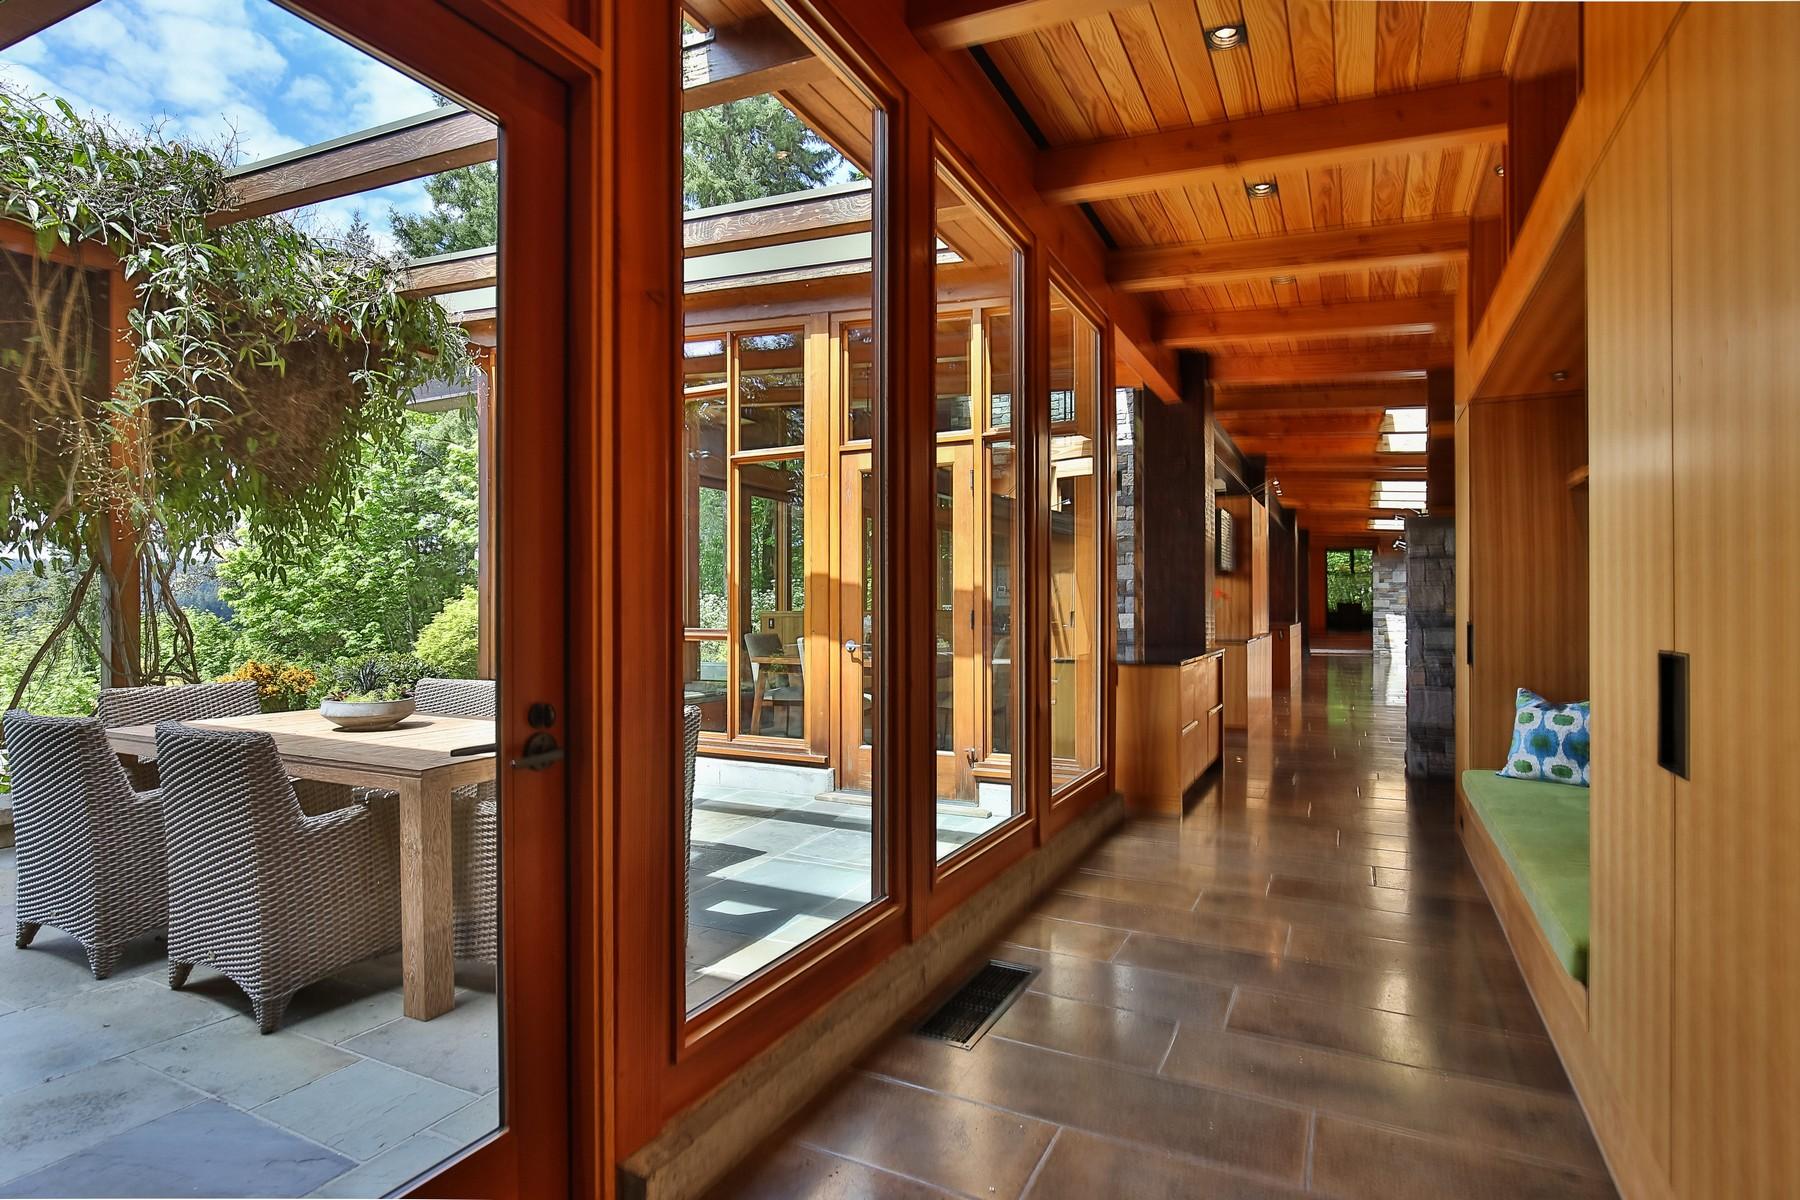 Additional photo for property listing at Picturesque waterfront estate RES5/3 Undisclosed Bainbridge Island, Washington 98110 United States